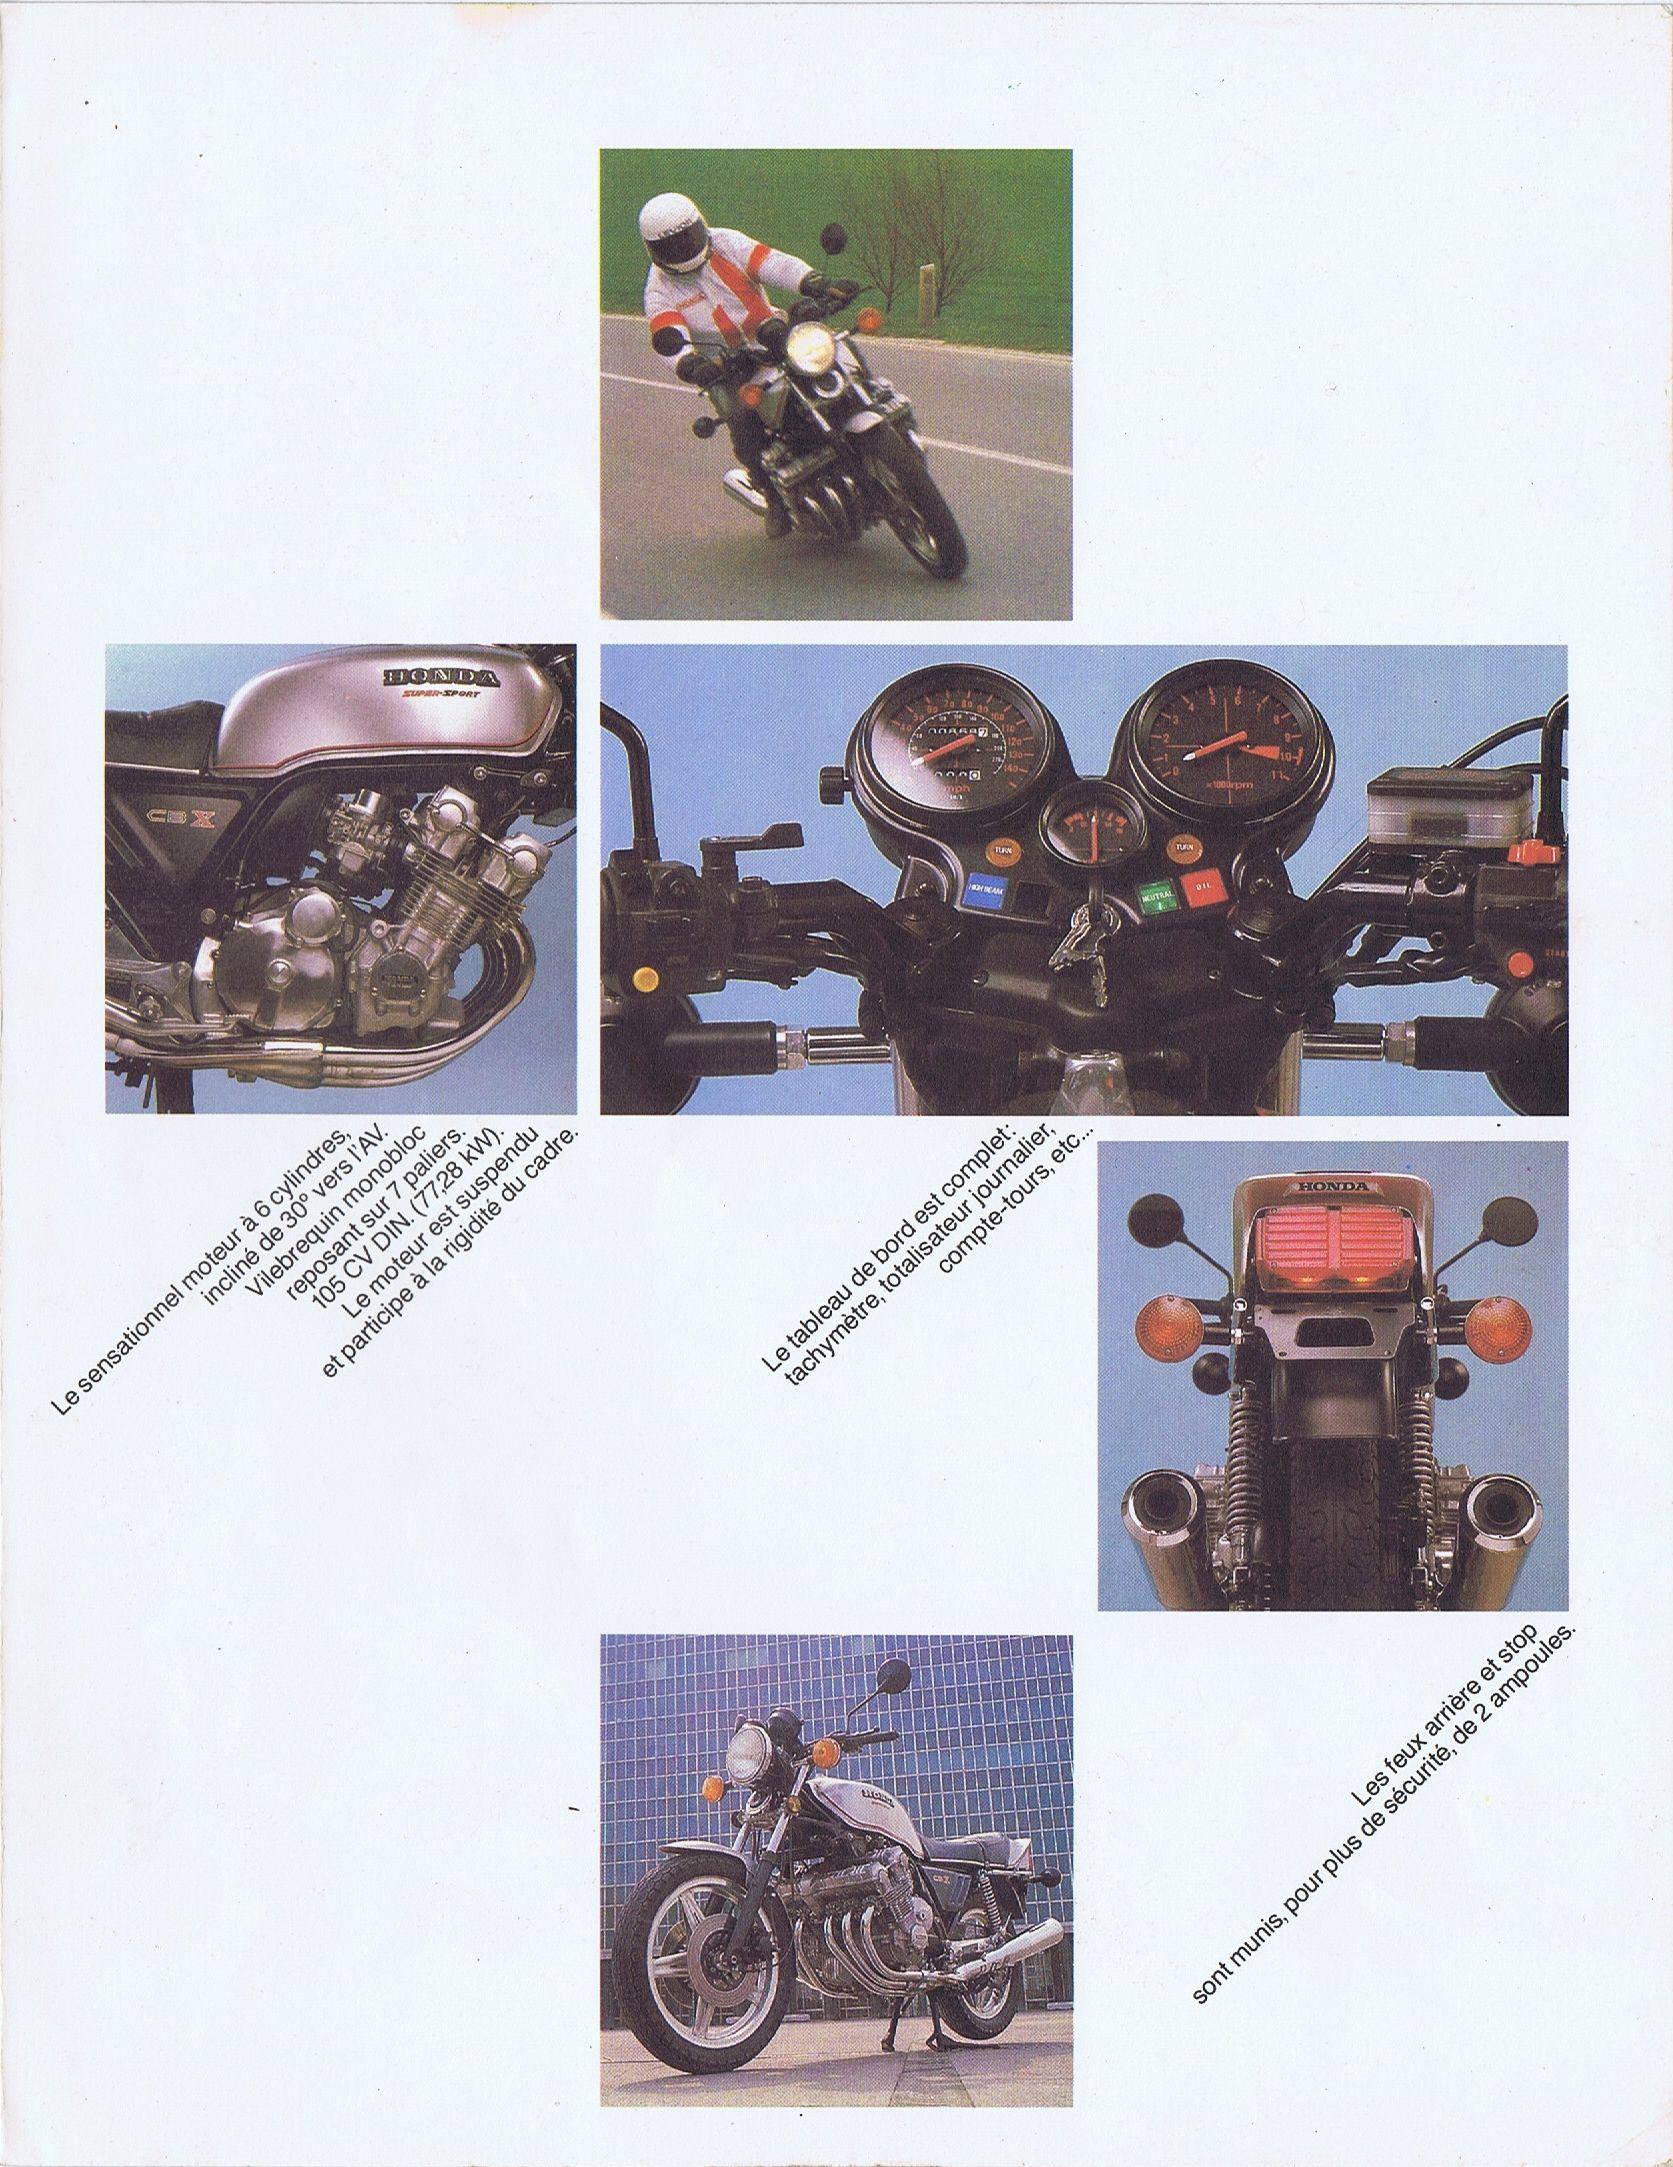 1978 02 Honda Cbx 1000 Brochure Netherland 07 Honda Cbx Honda Sports Sedan